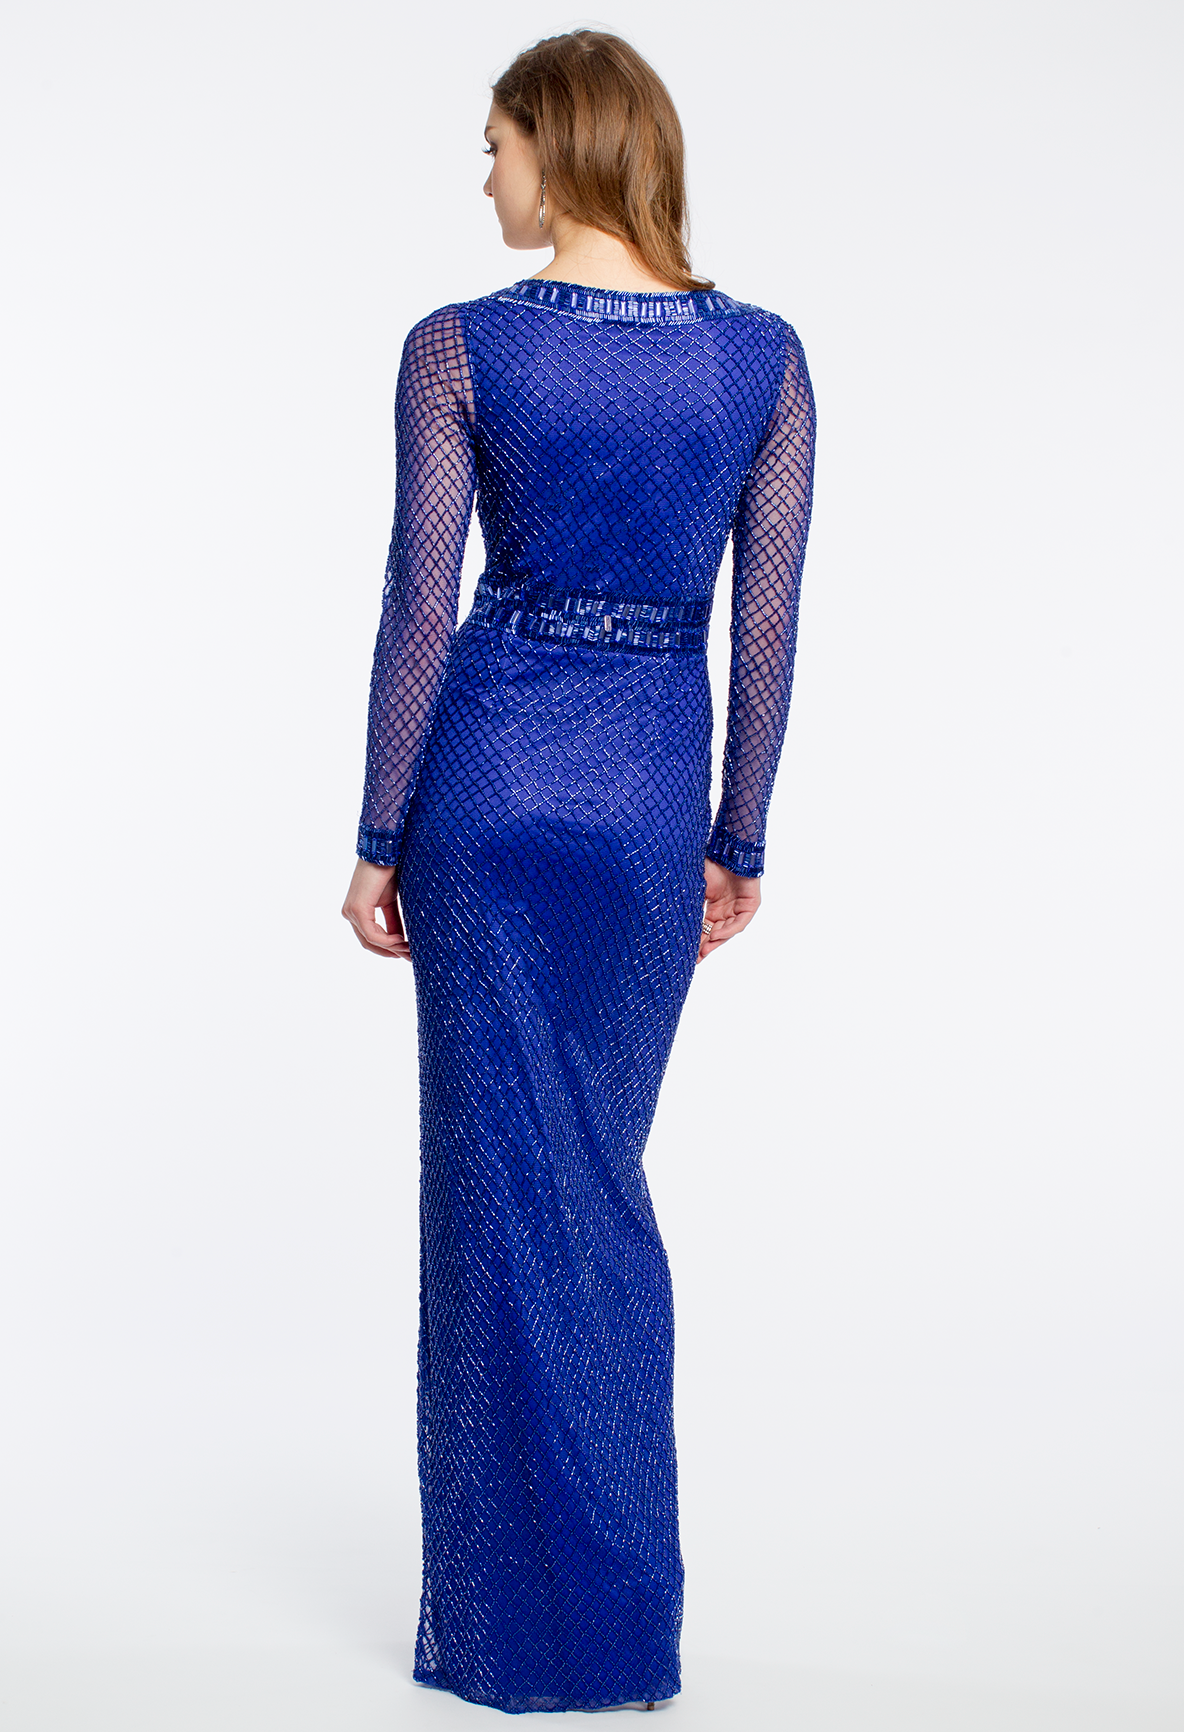 Illusion sleeve fully beaded prom dress camillelavie clvprom